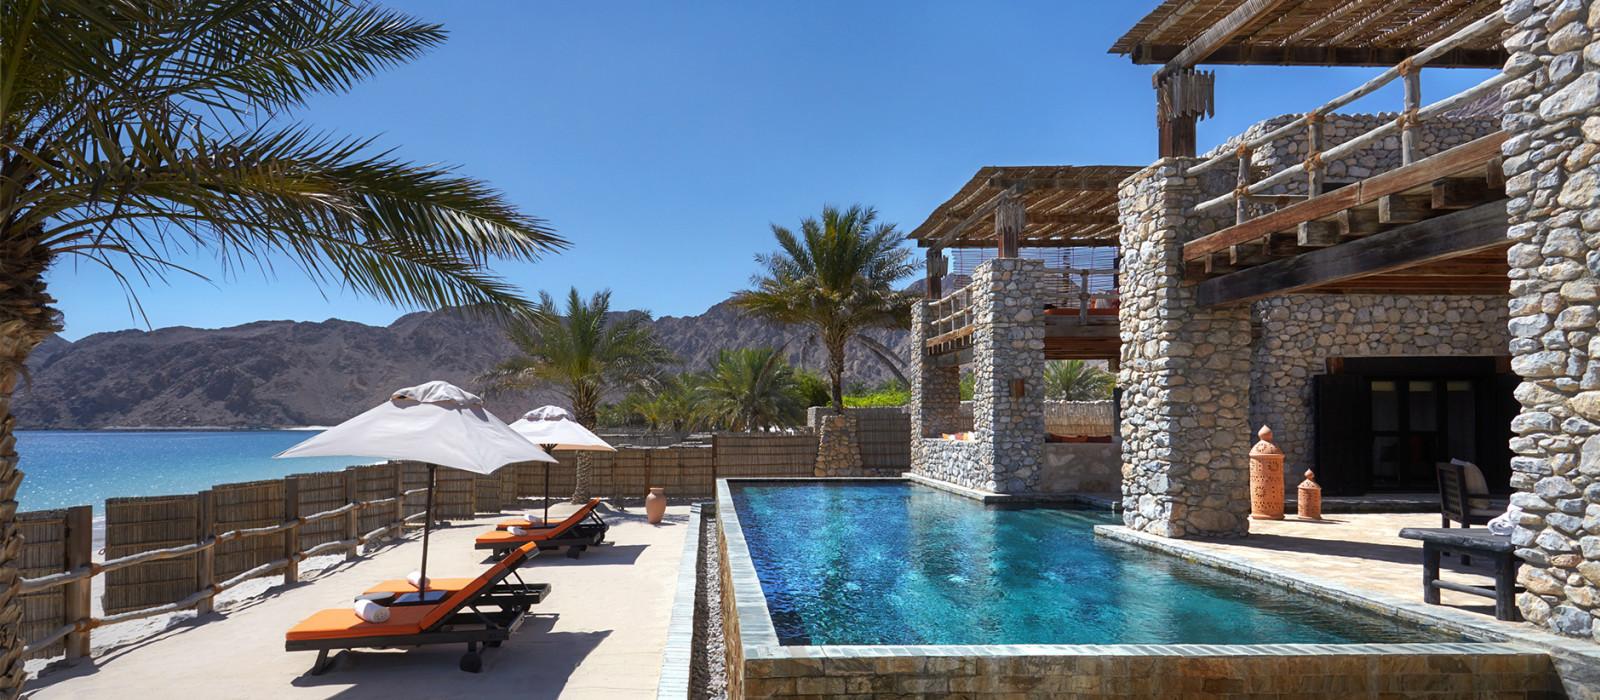 Hotel Six Senses Zighy Bay Oman